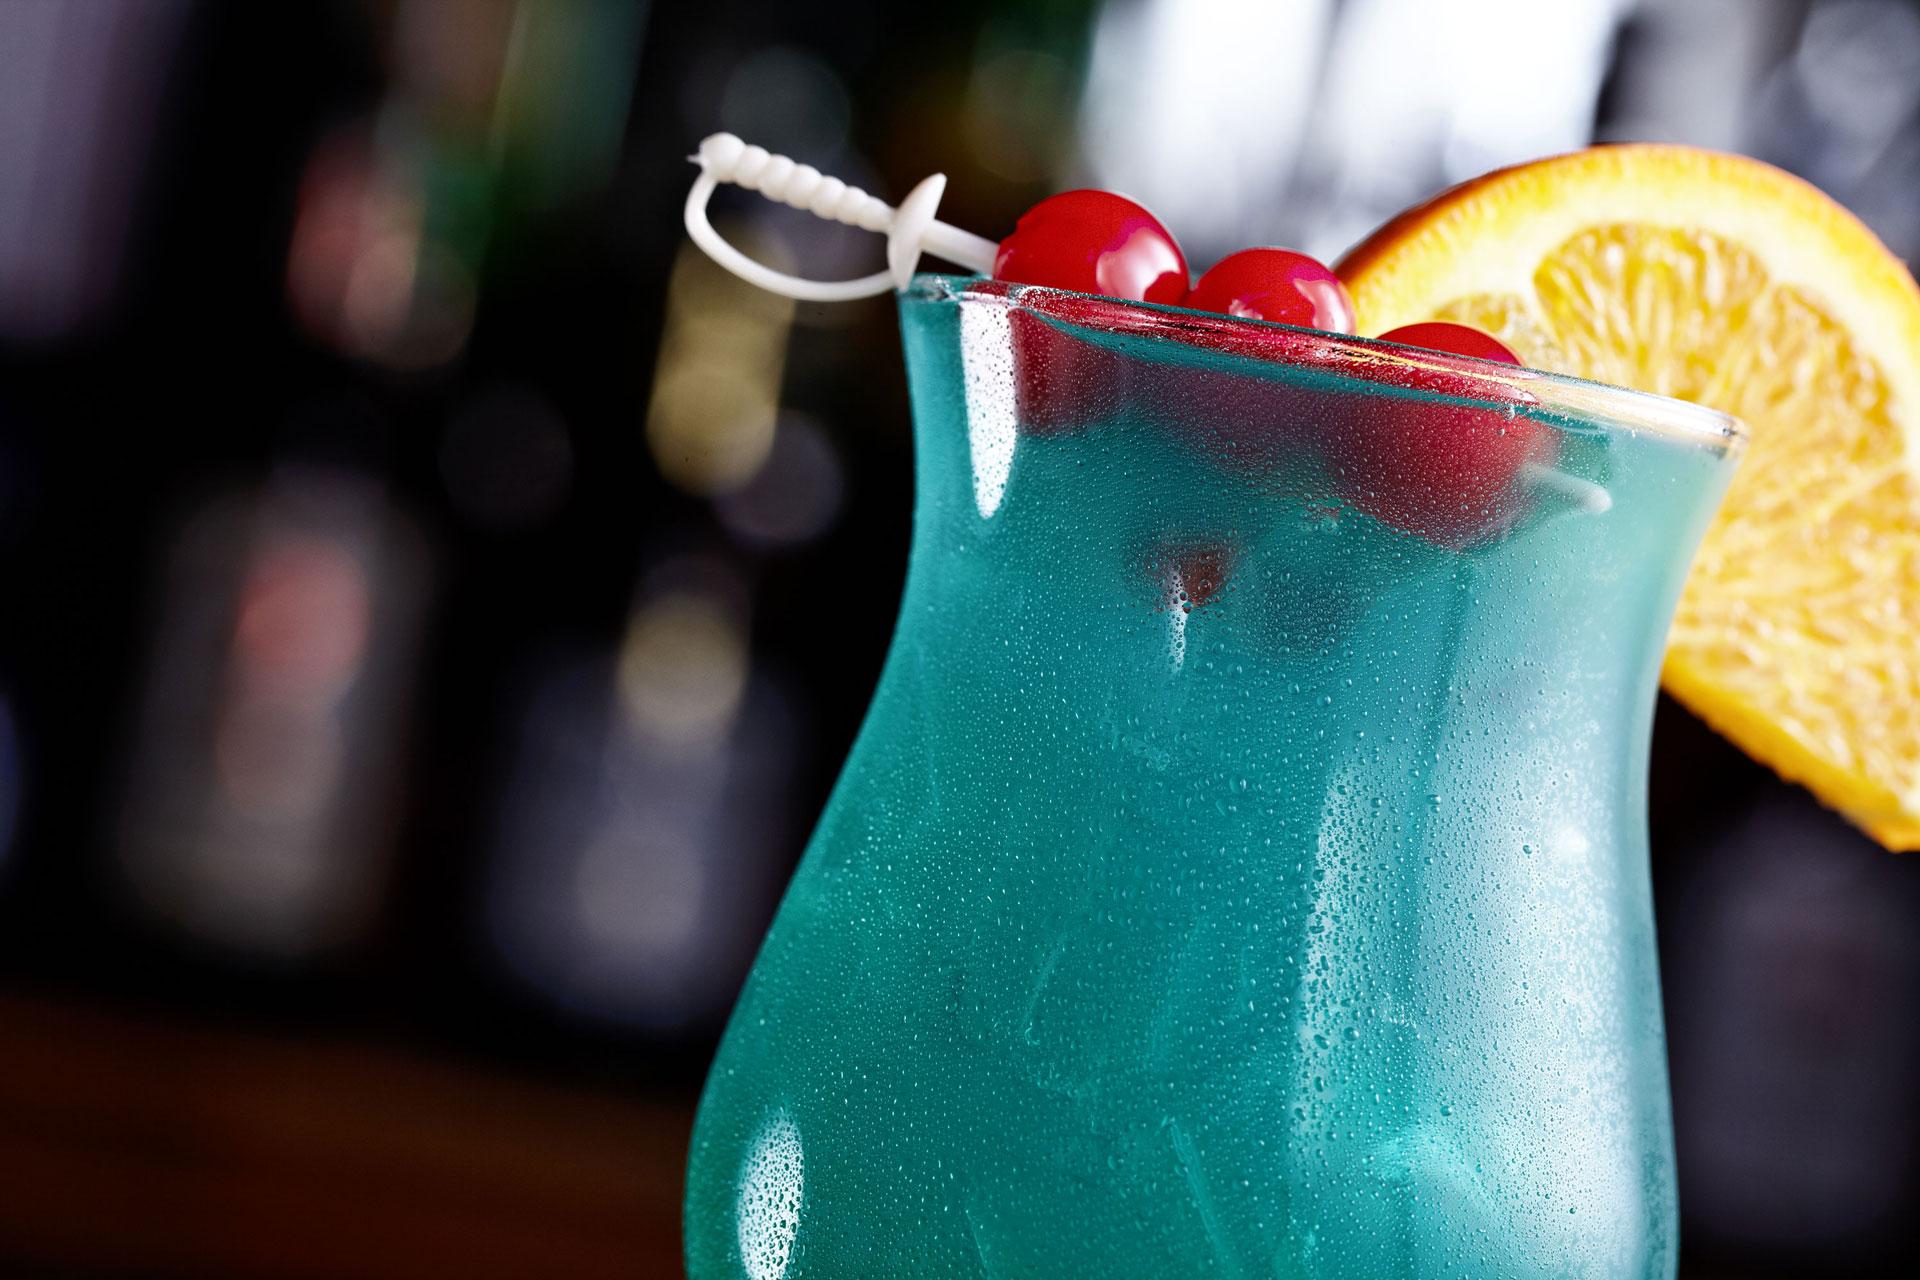 Fresh fruit cocktails and stiff drinks alike, we have a great drink selection at Chameleon in Northside Cincinnati.